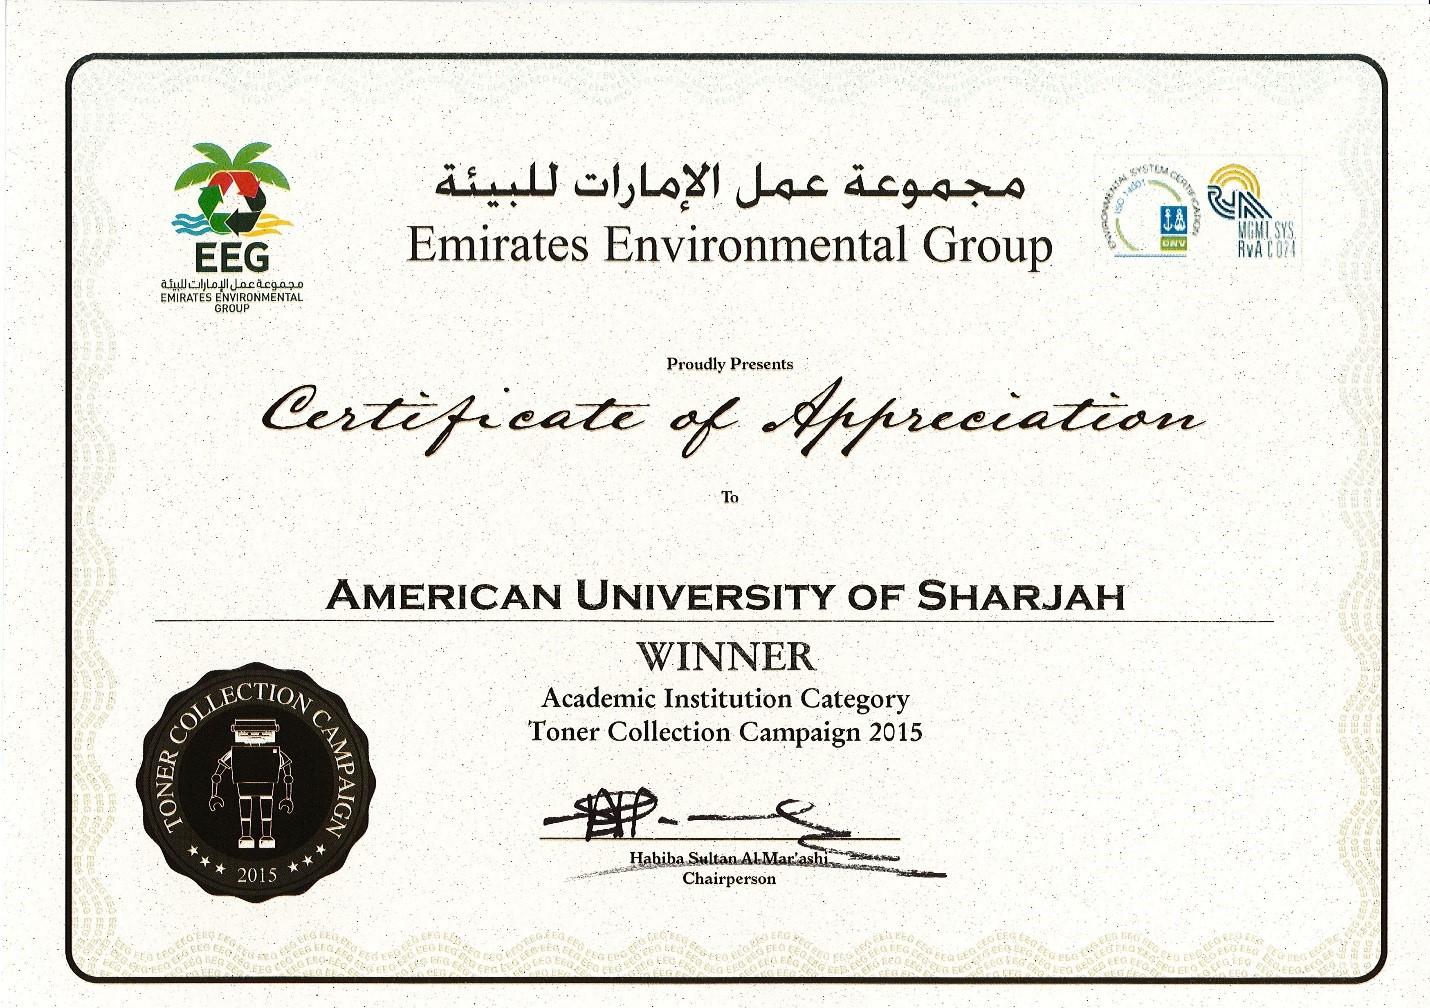 American_University_of_Sharjah_-_Recycling_2.jpg